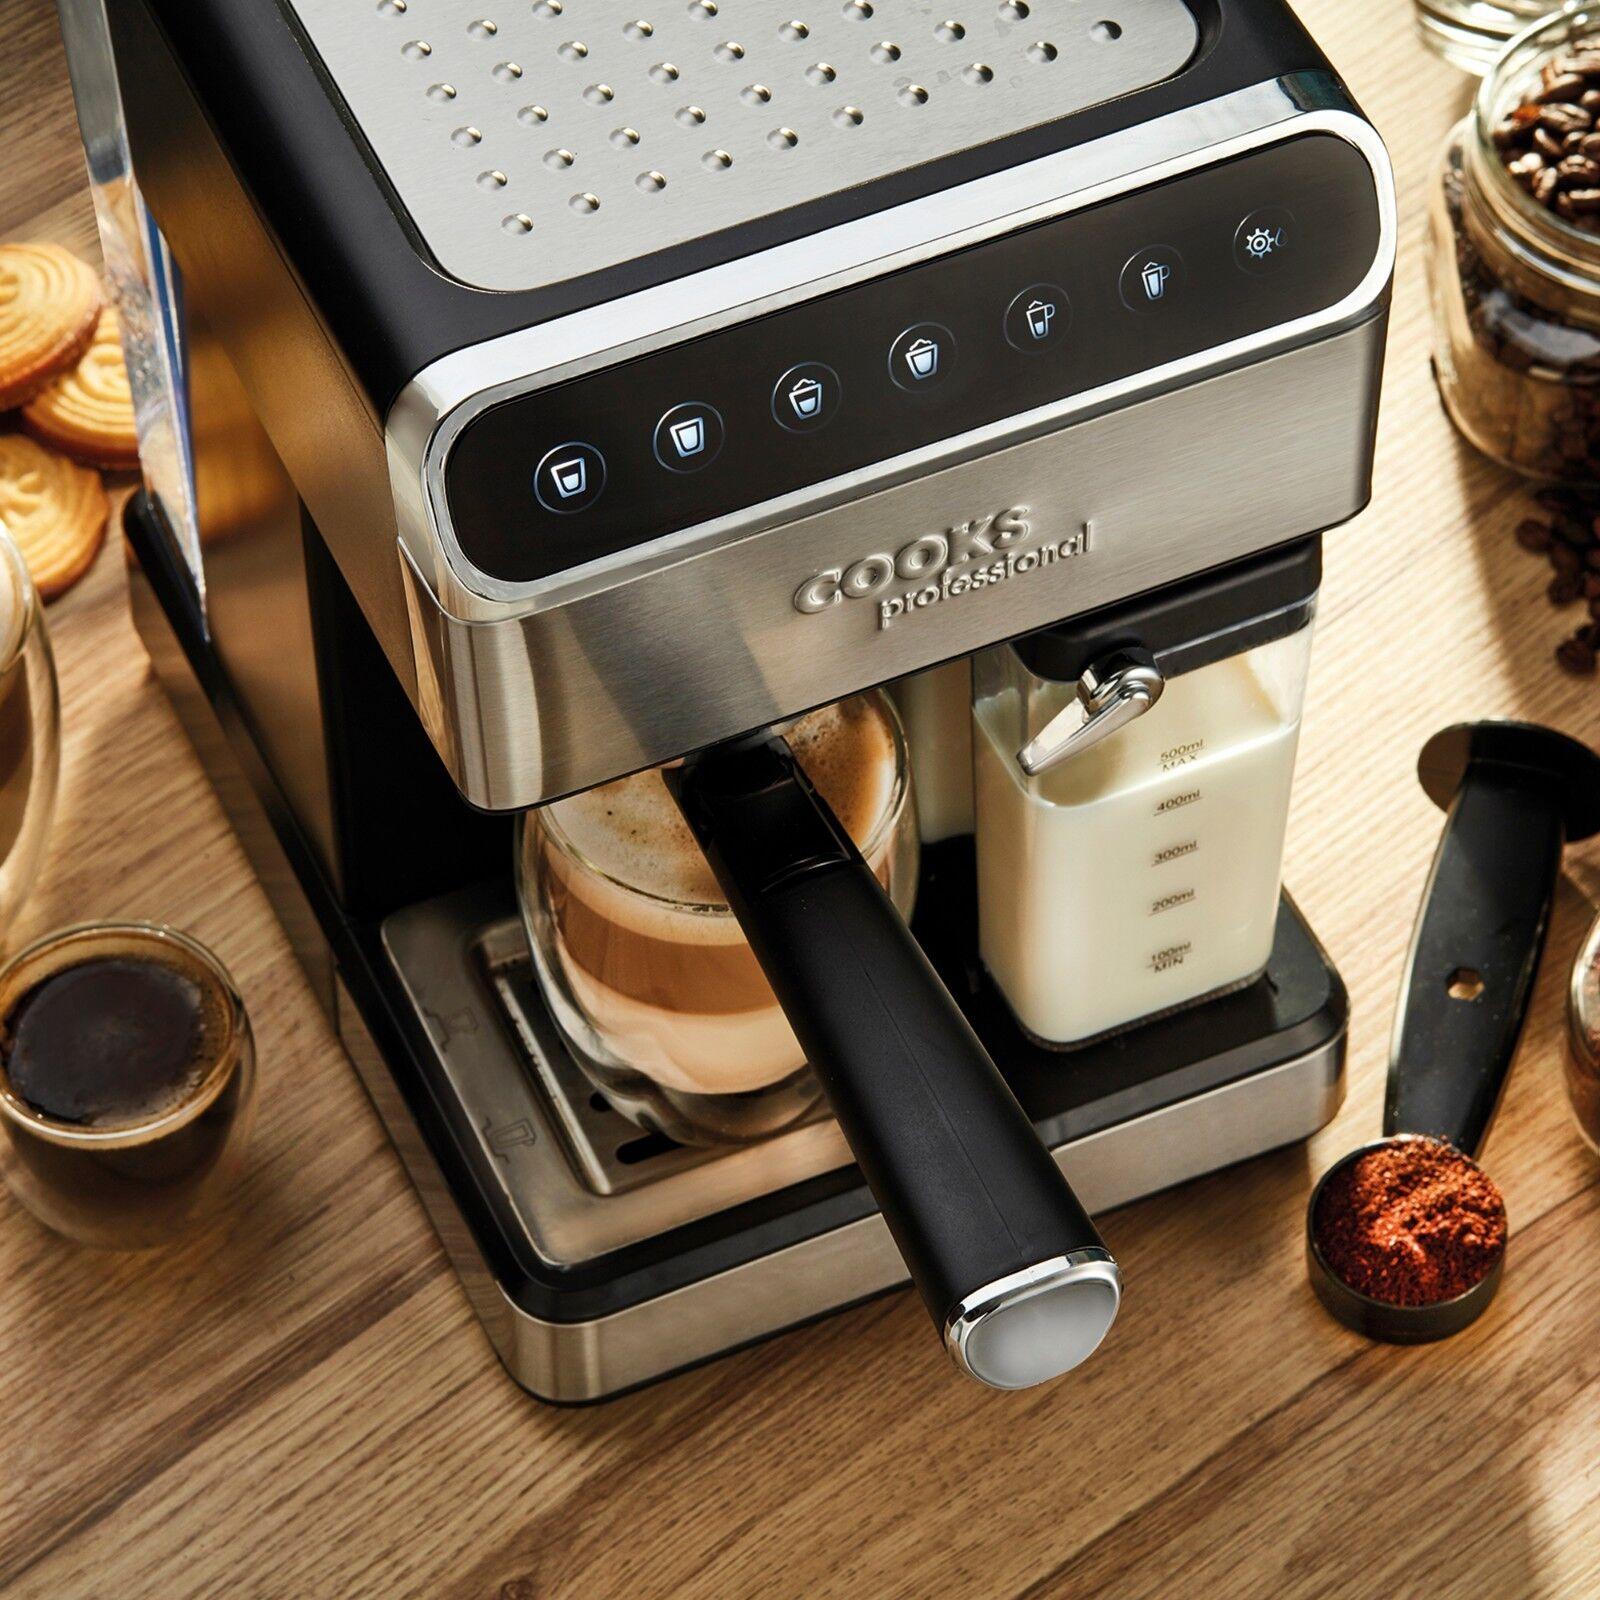 Details about Cooks Professional Espresso Coffee Machine Maker 15 Bar Digital Barista 1350W